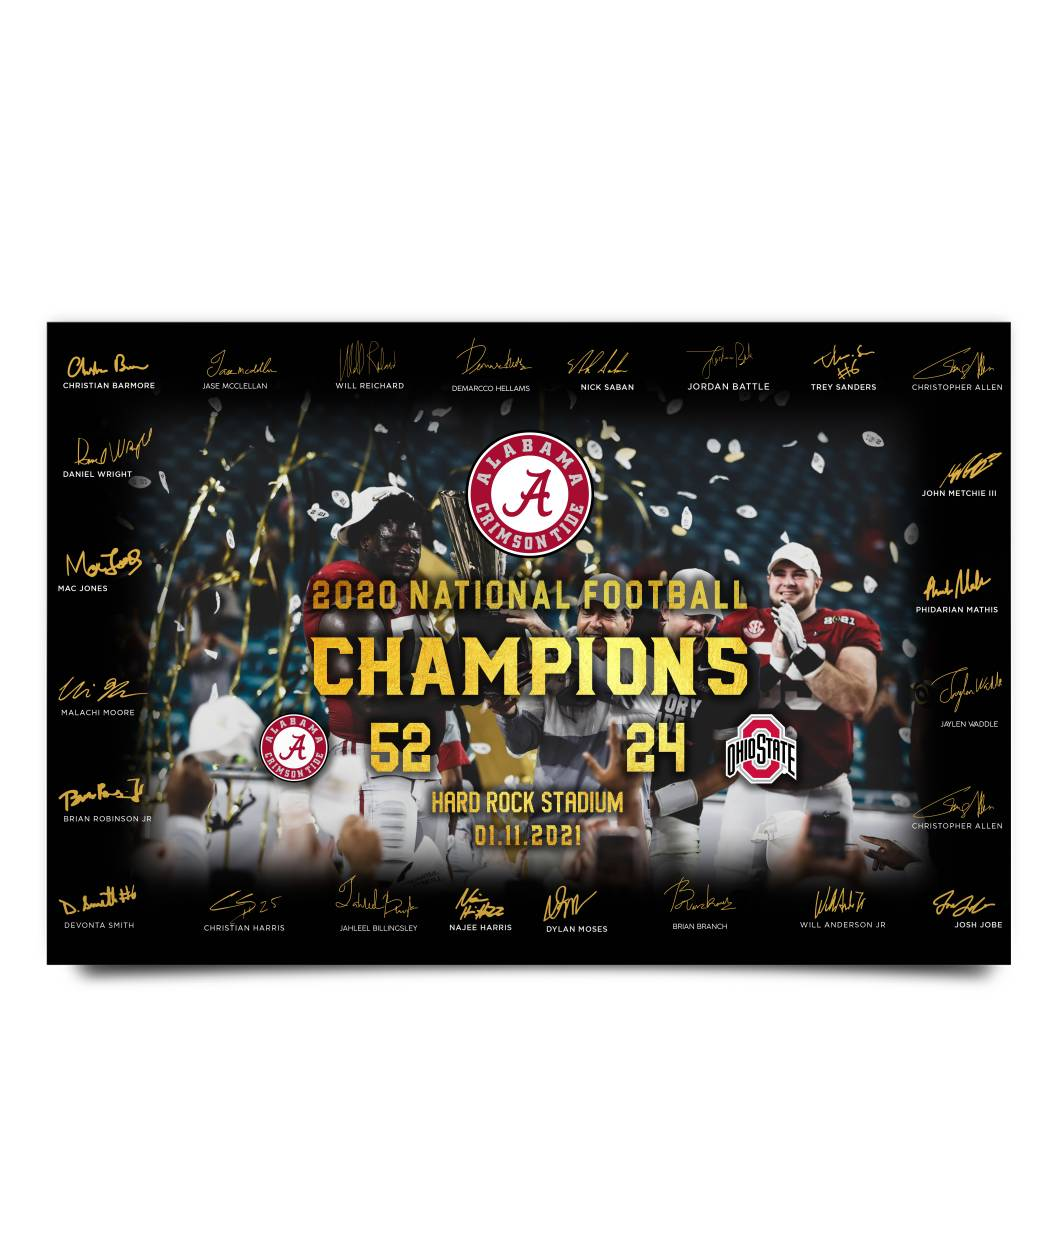 Alabama Crimson 2020 National Football Champion Player Signatures Poster